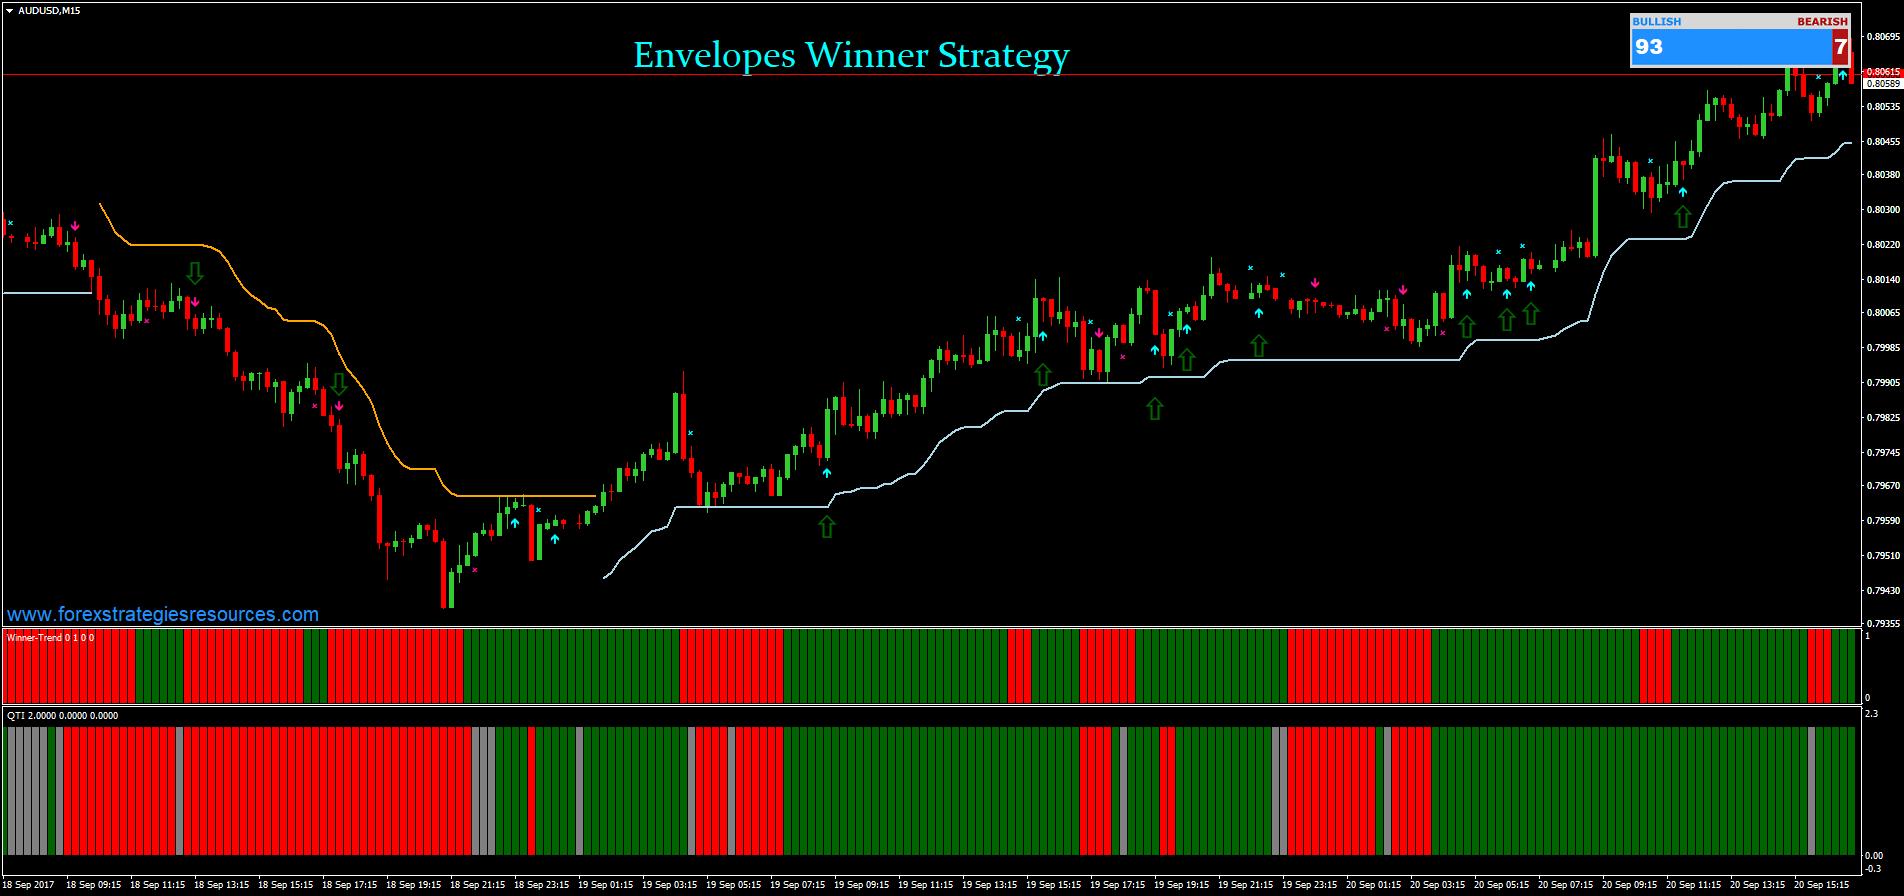 Envelope strategy forex